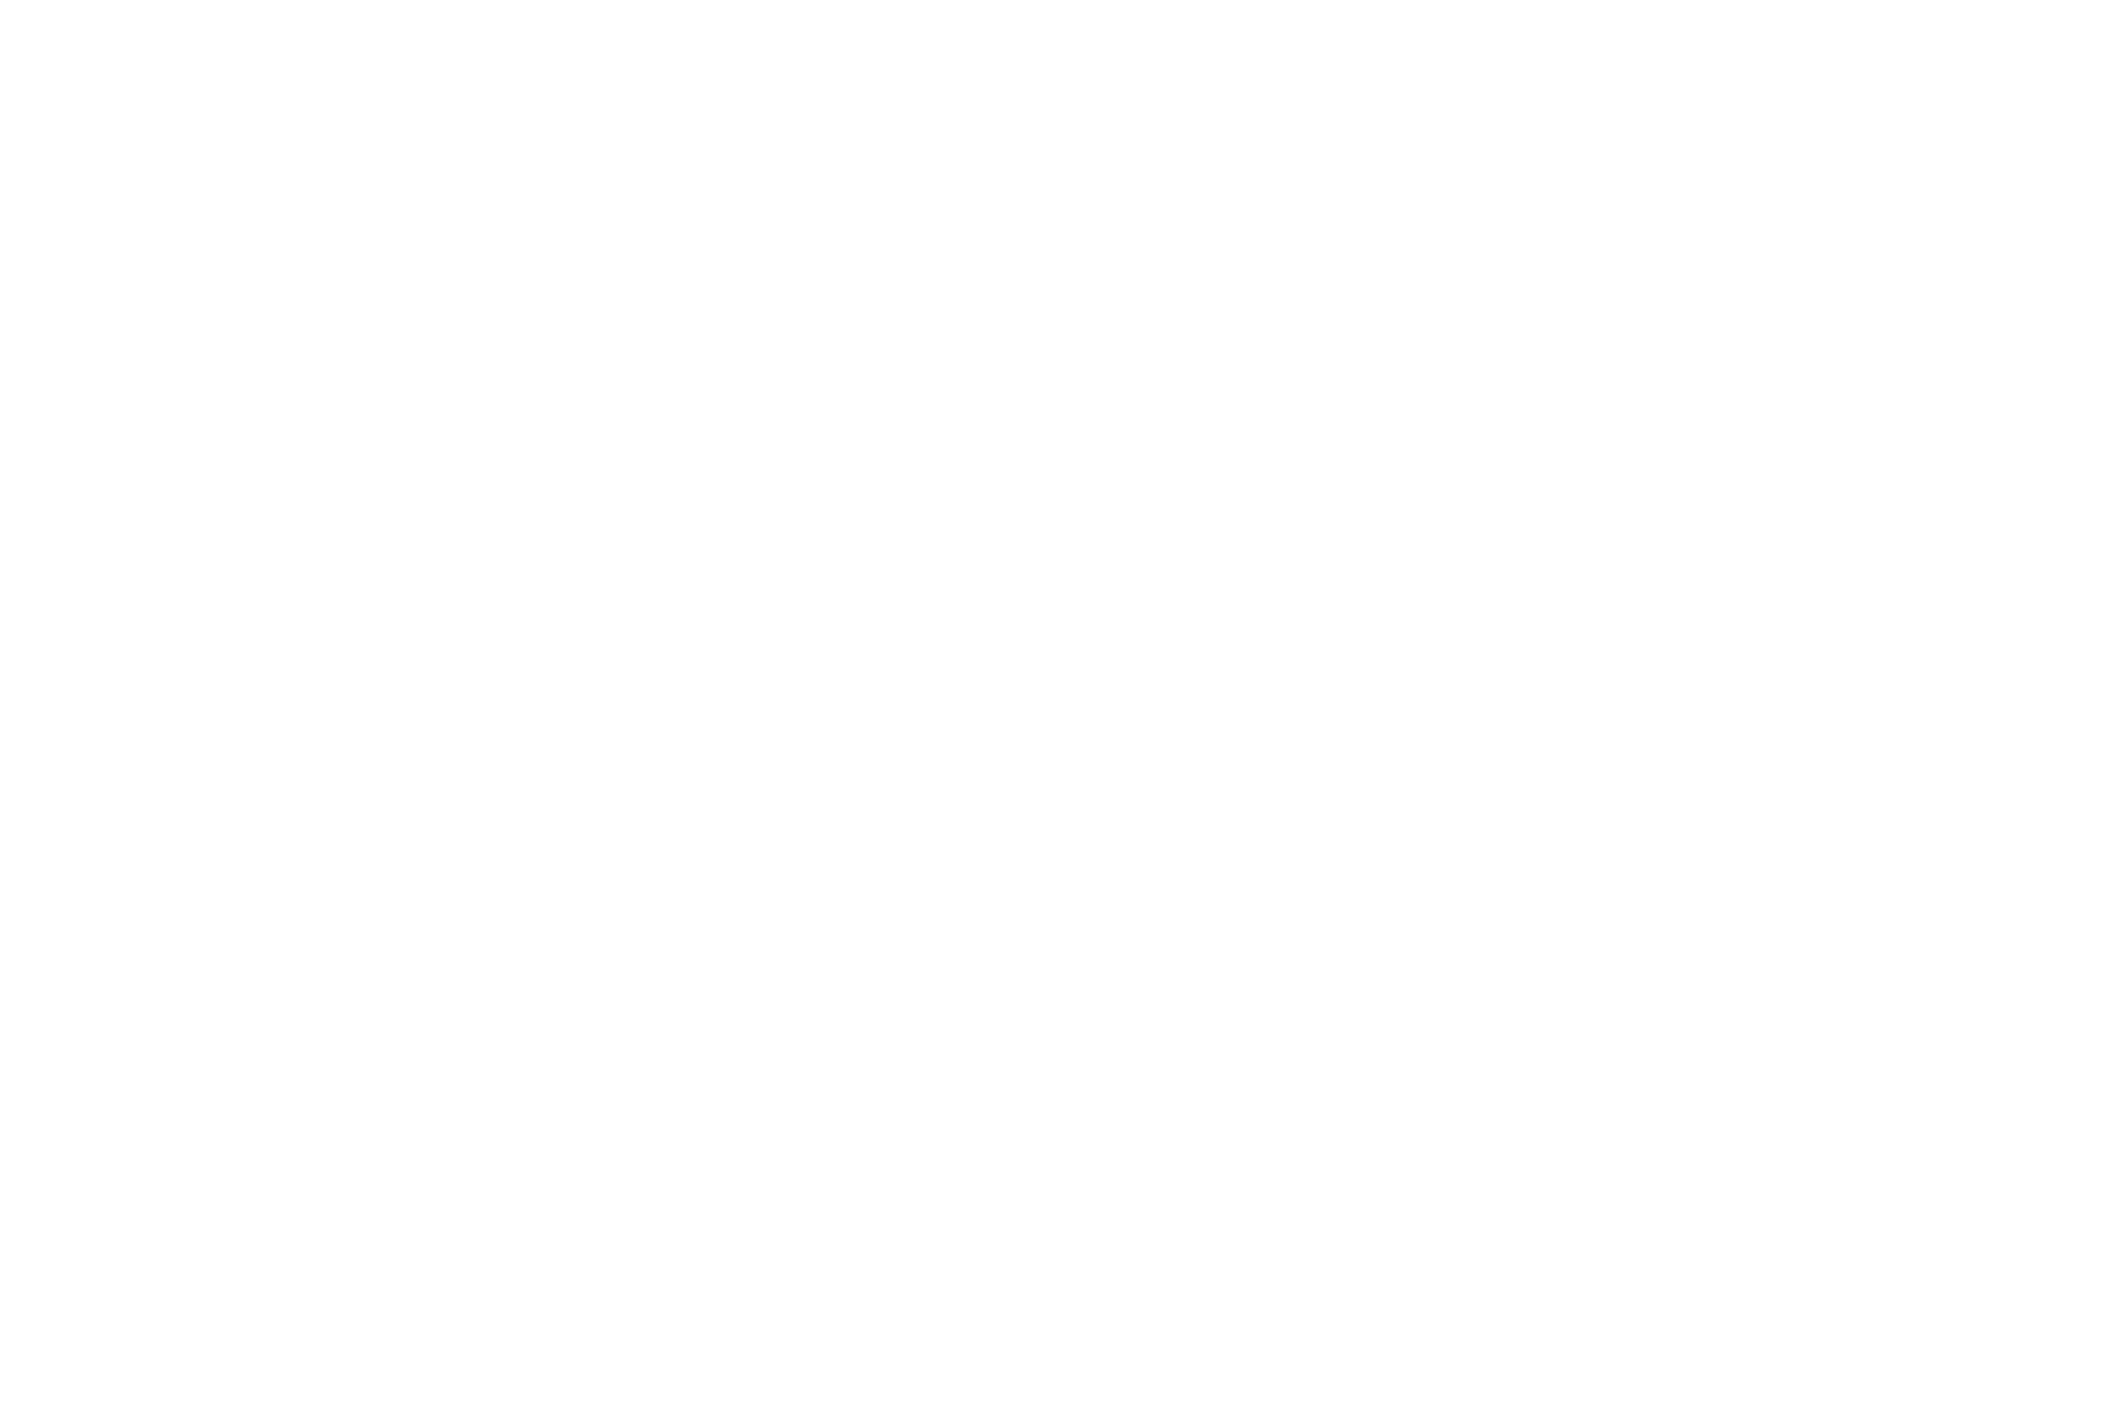 linq-1